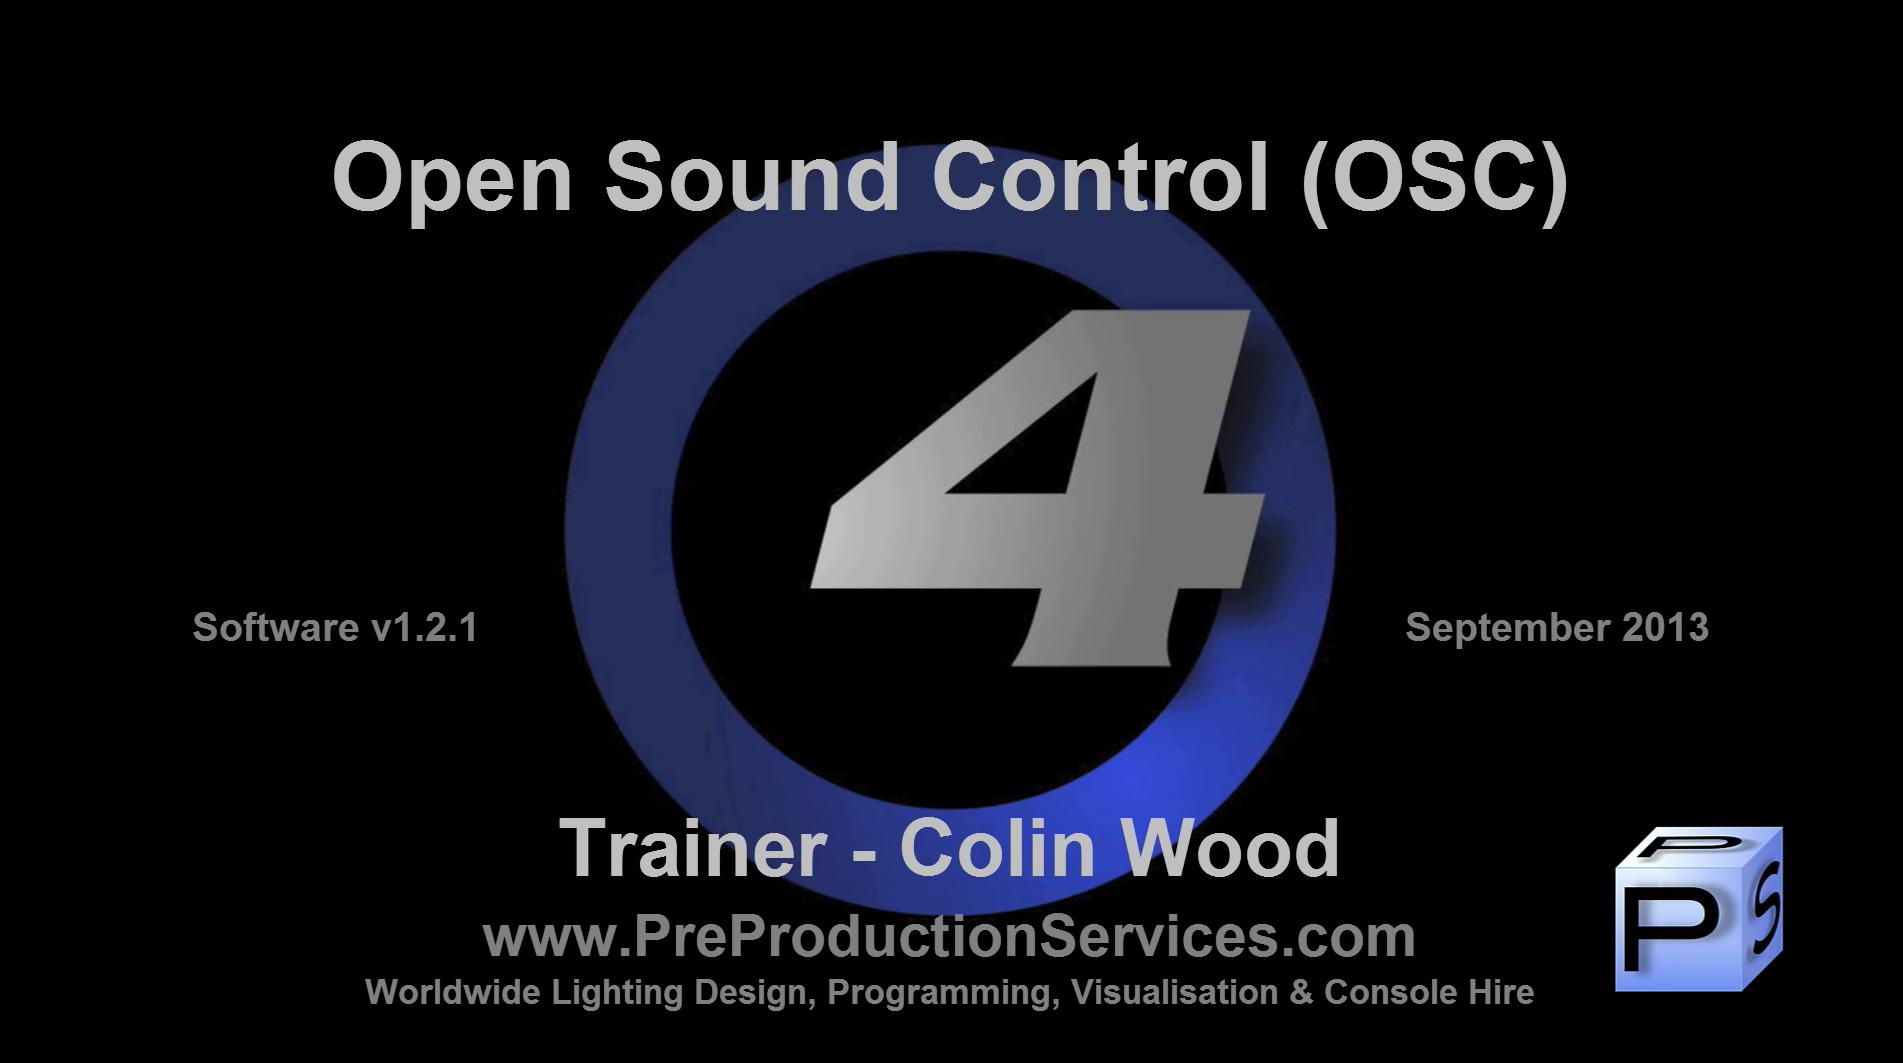 Colin Wood 42nd Street Thumbnail.JPG